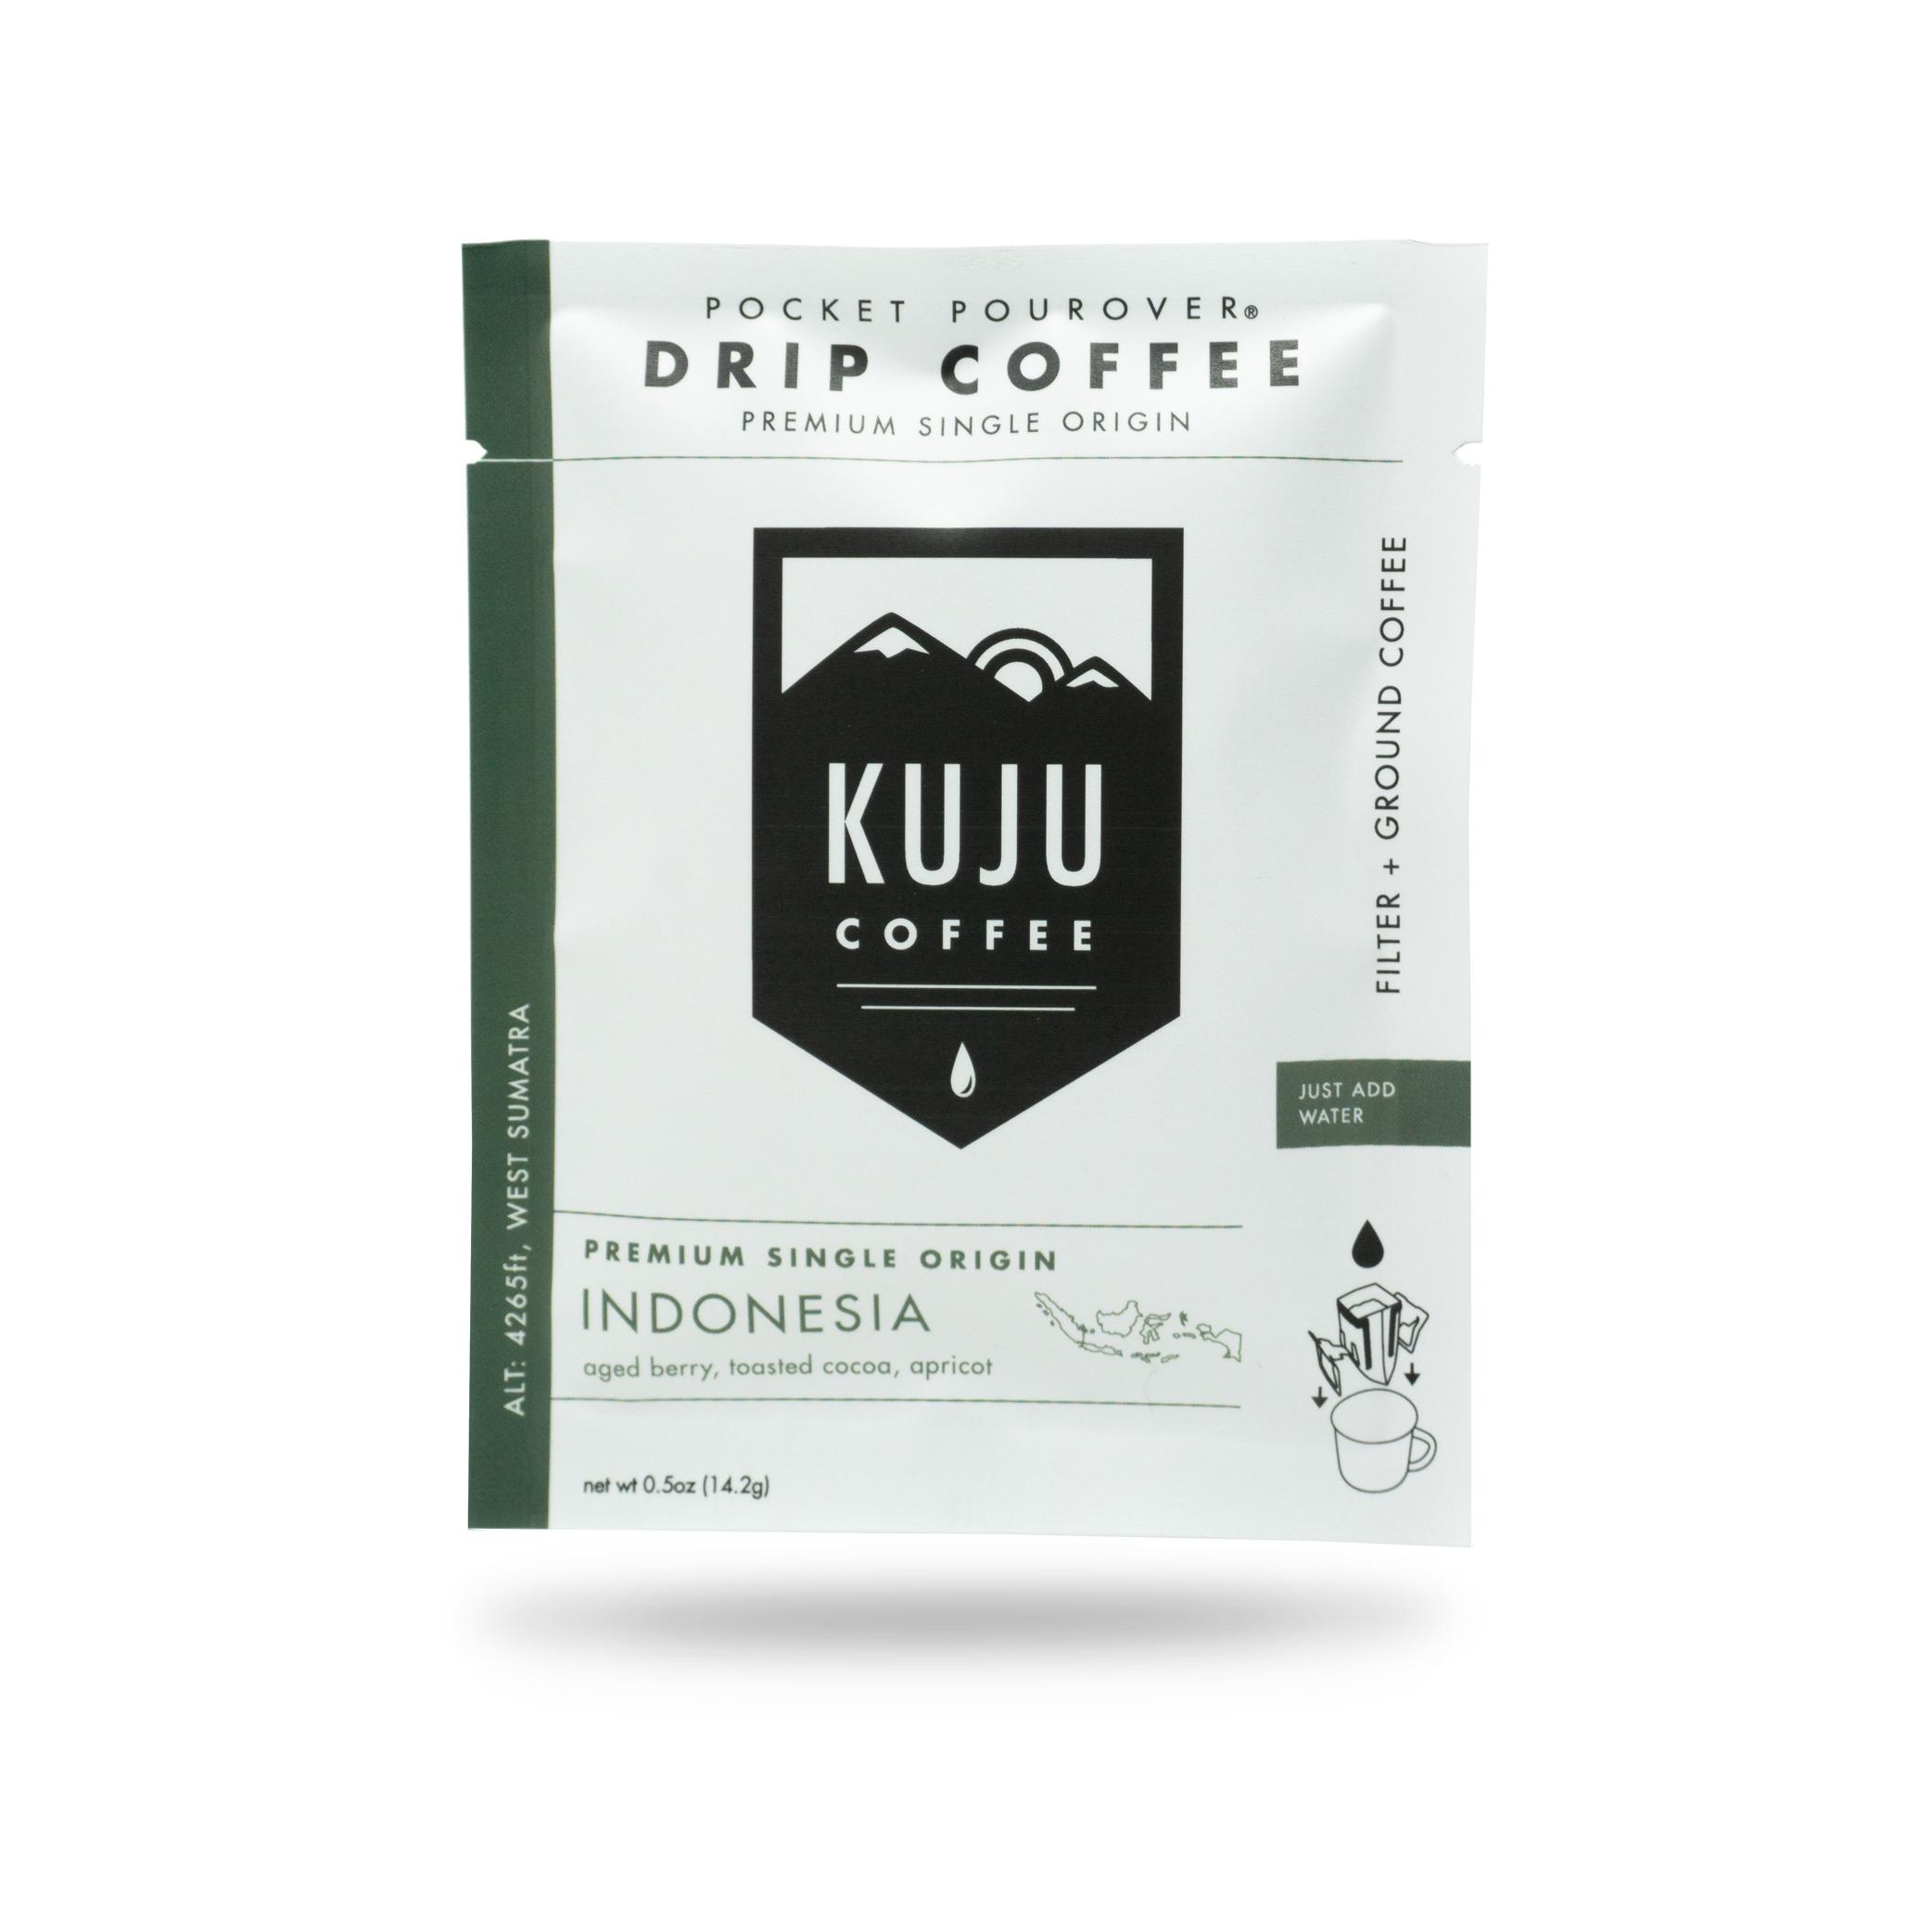 Kuju Coffee Launches Single Origin Pocket PourOvers